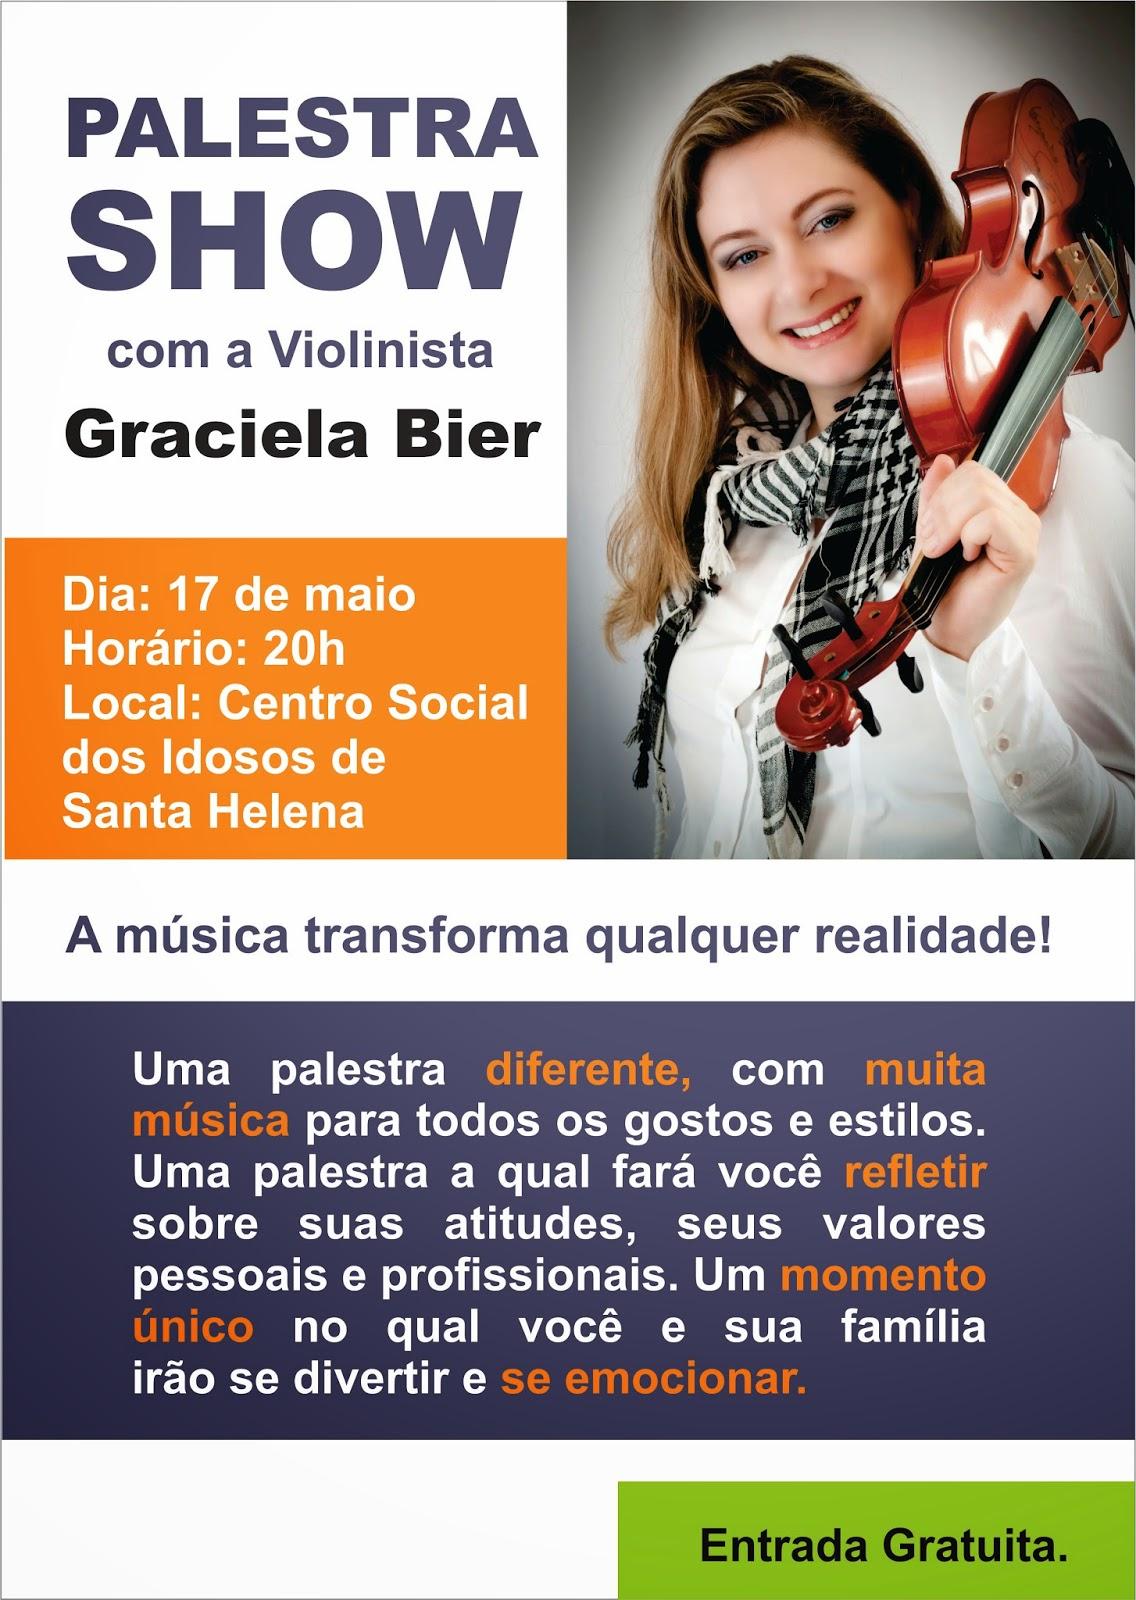 Graciela Bier Palestra Motivacional E Recital De Violino